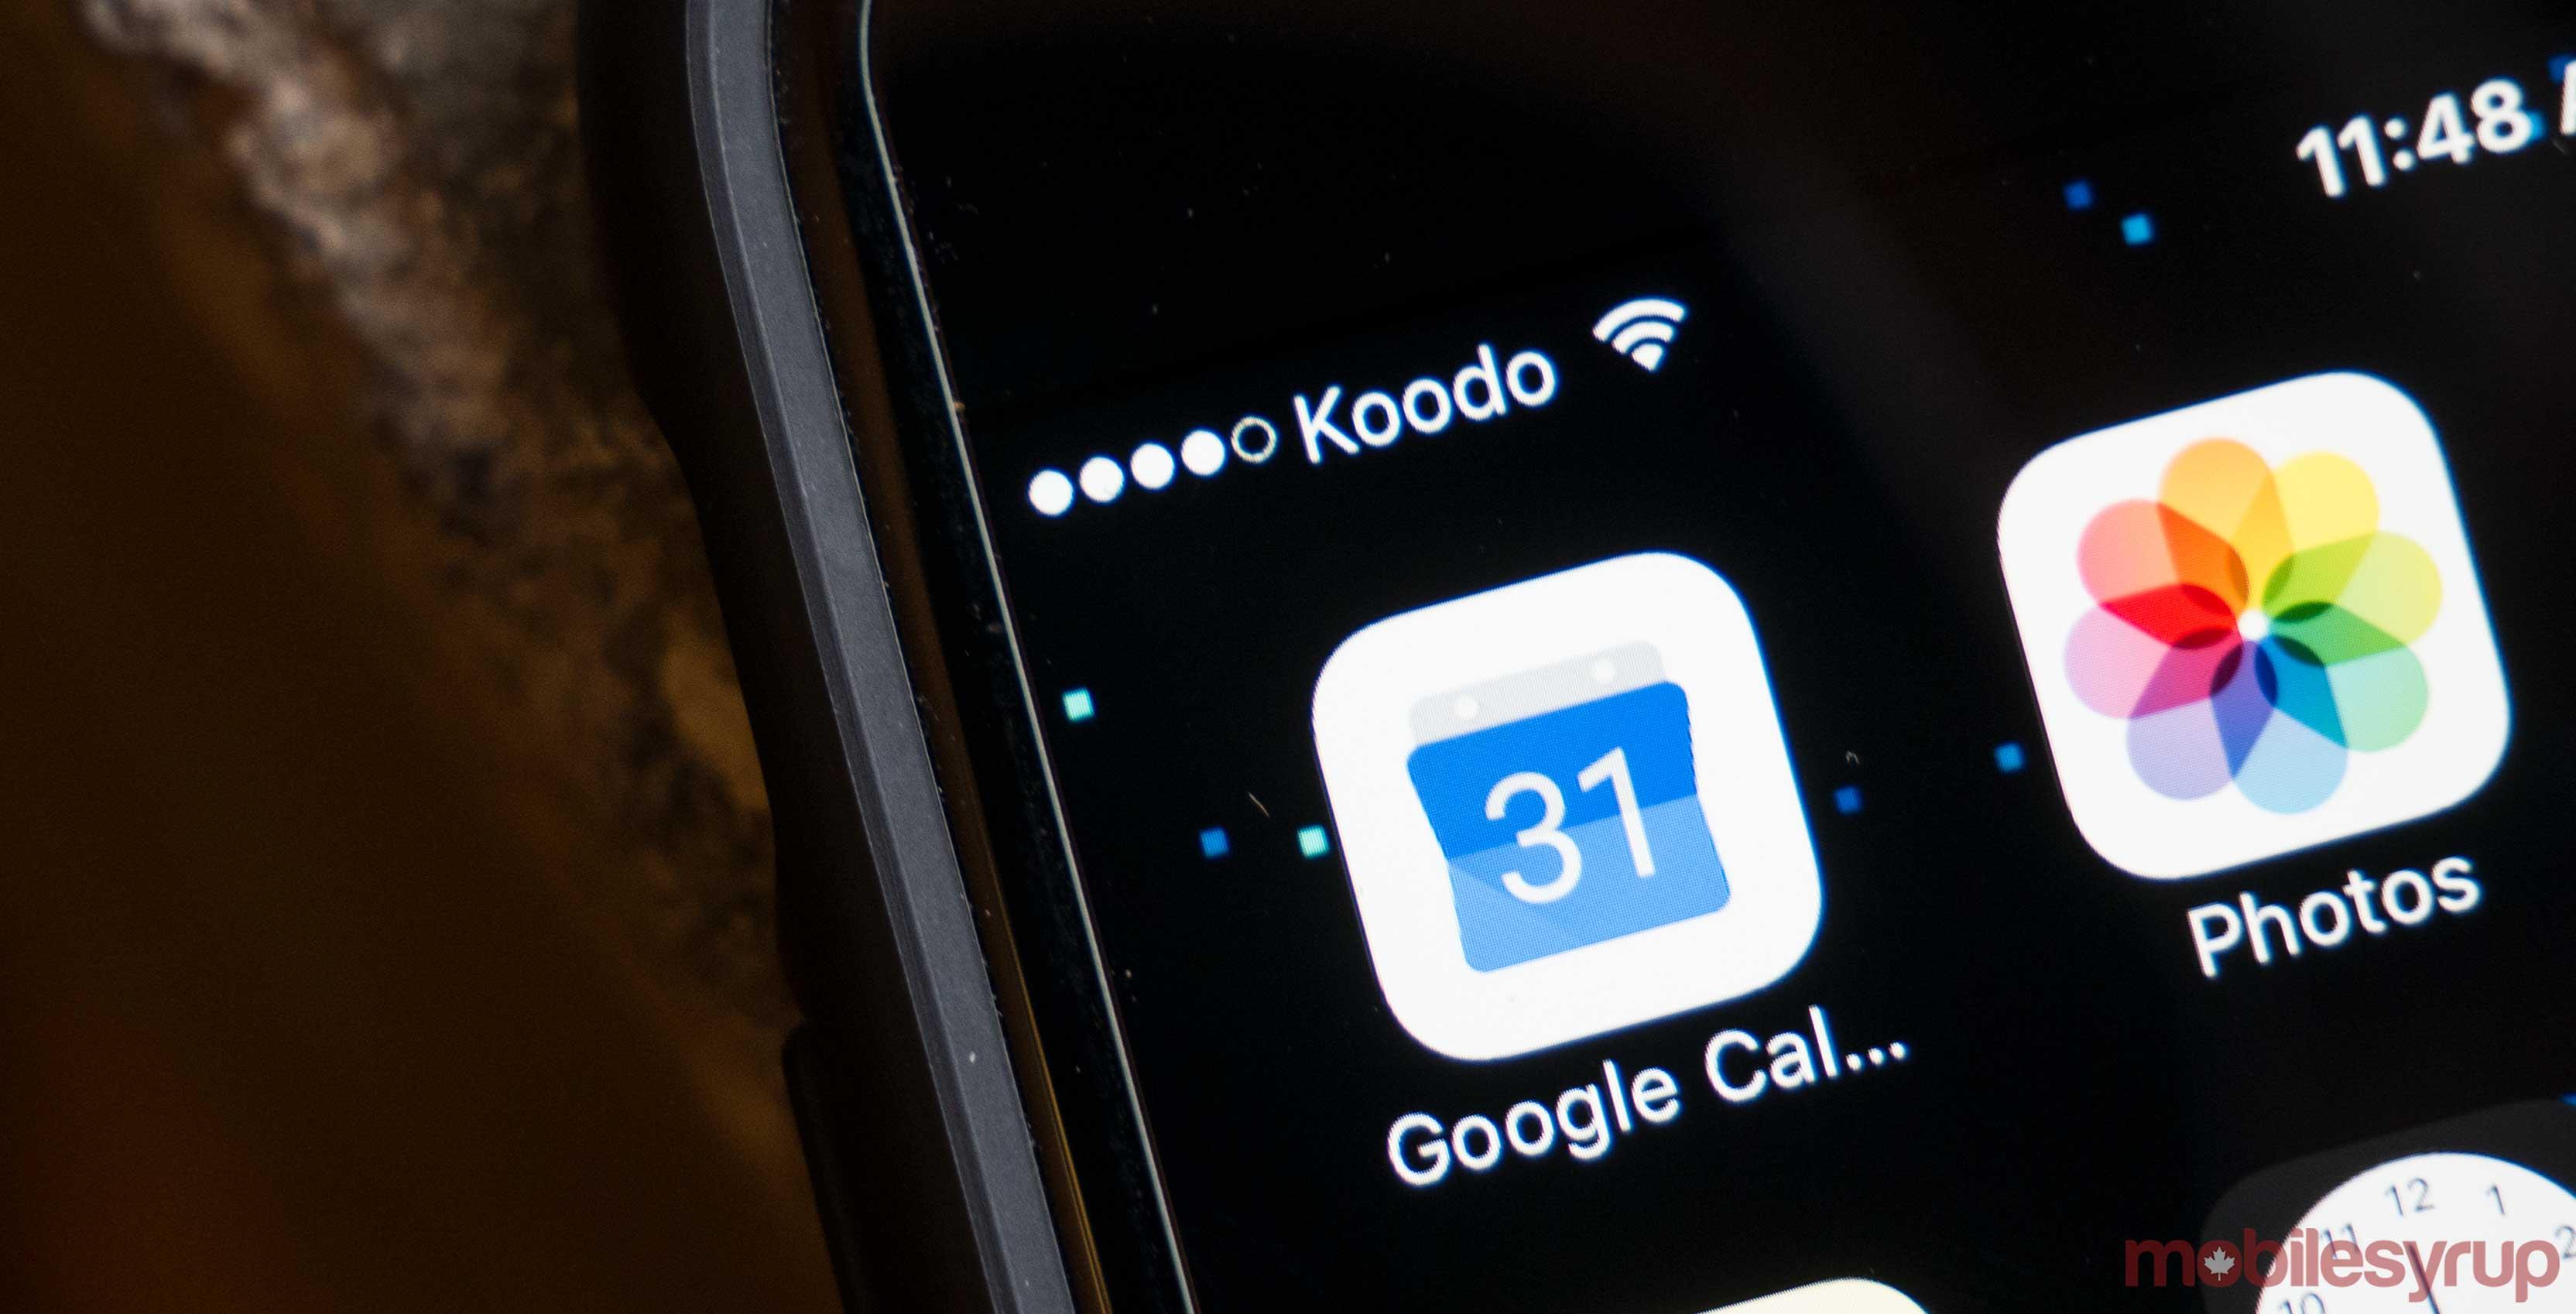 Koodo wireless signal shown on a smartphone